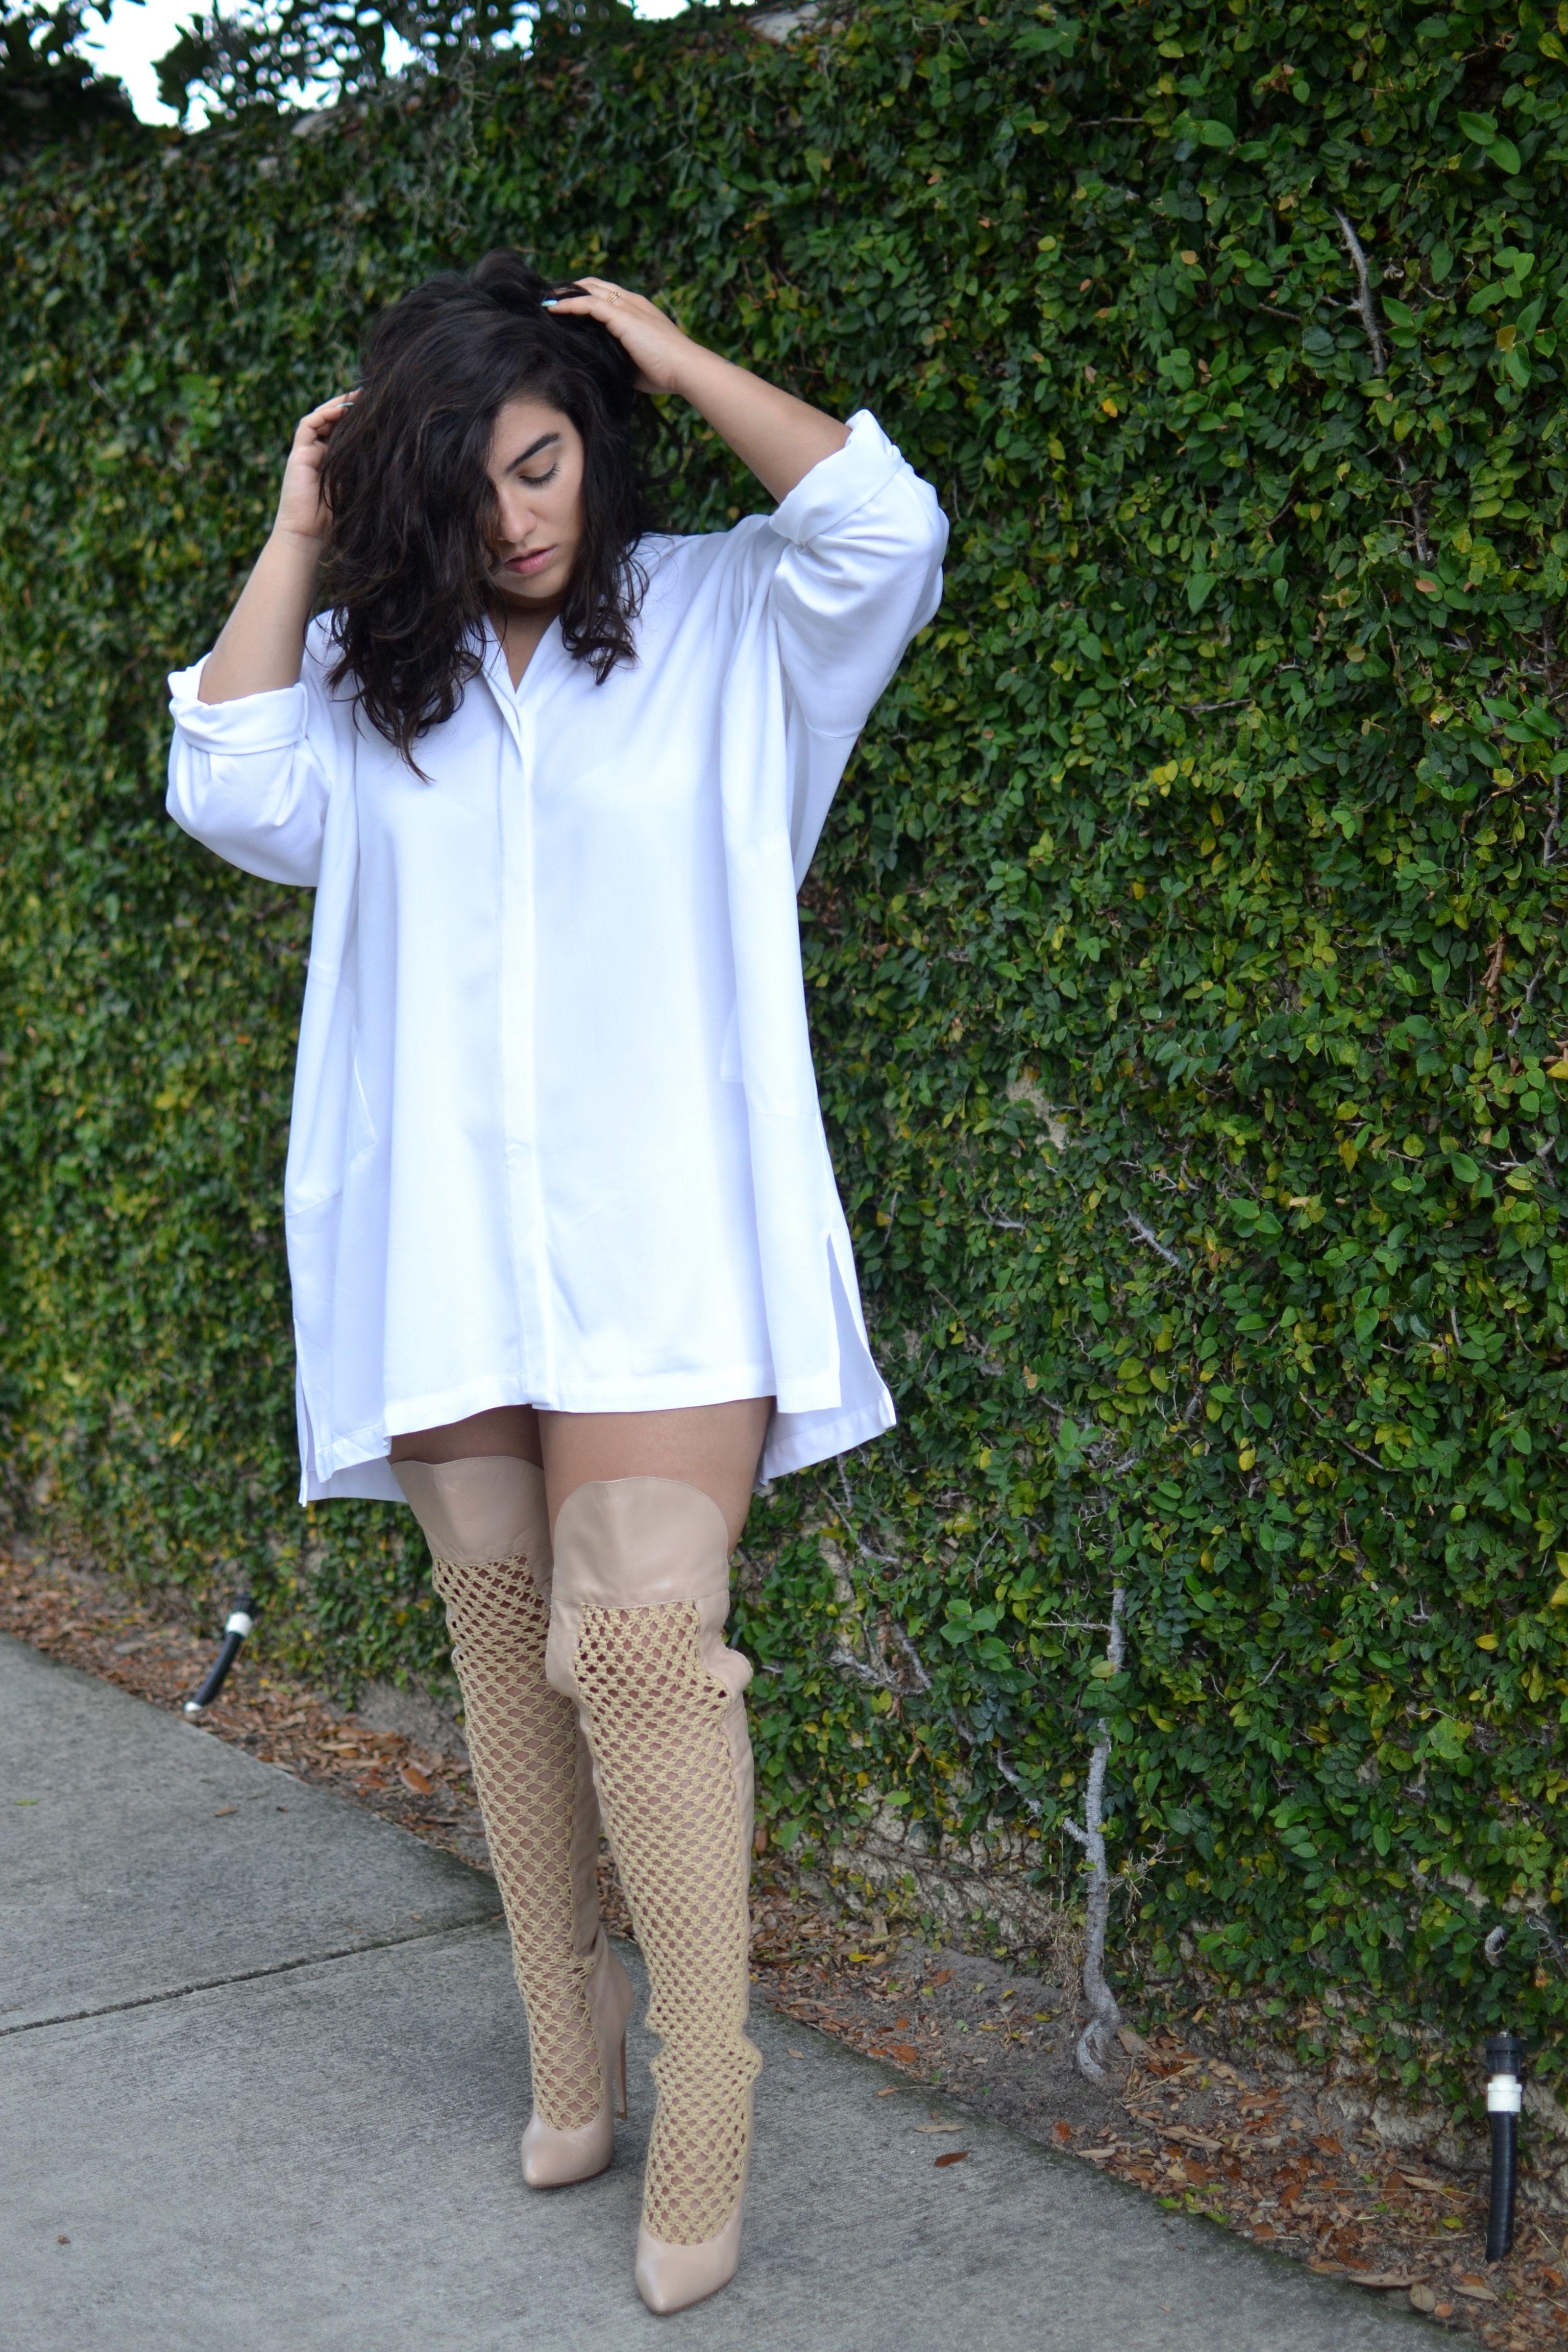 c926a8d5ee0 Plus Size Clothing · Plus Sizes Fashion · Nadia Aboulhosn wearing the  Shaina Mote Mandela Dress http   www.meismith.